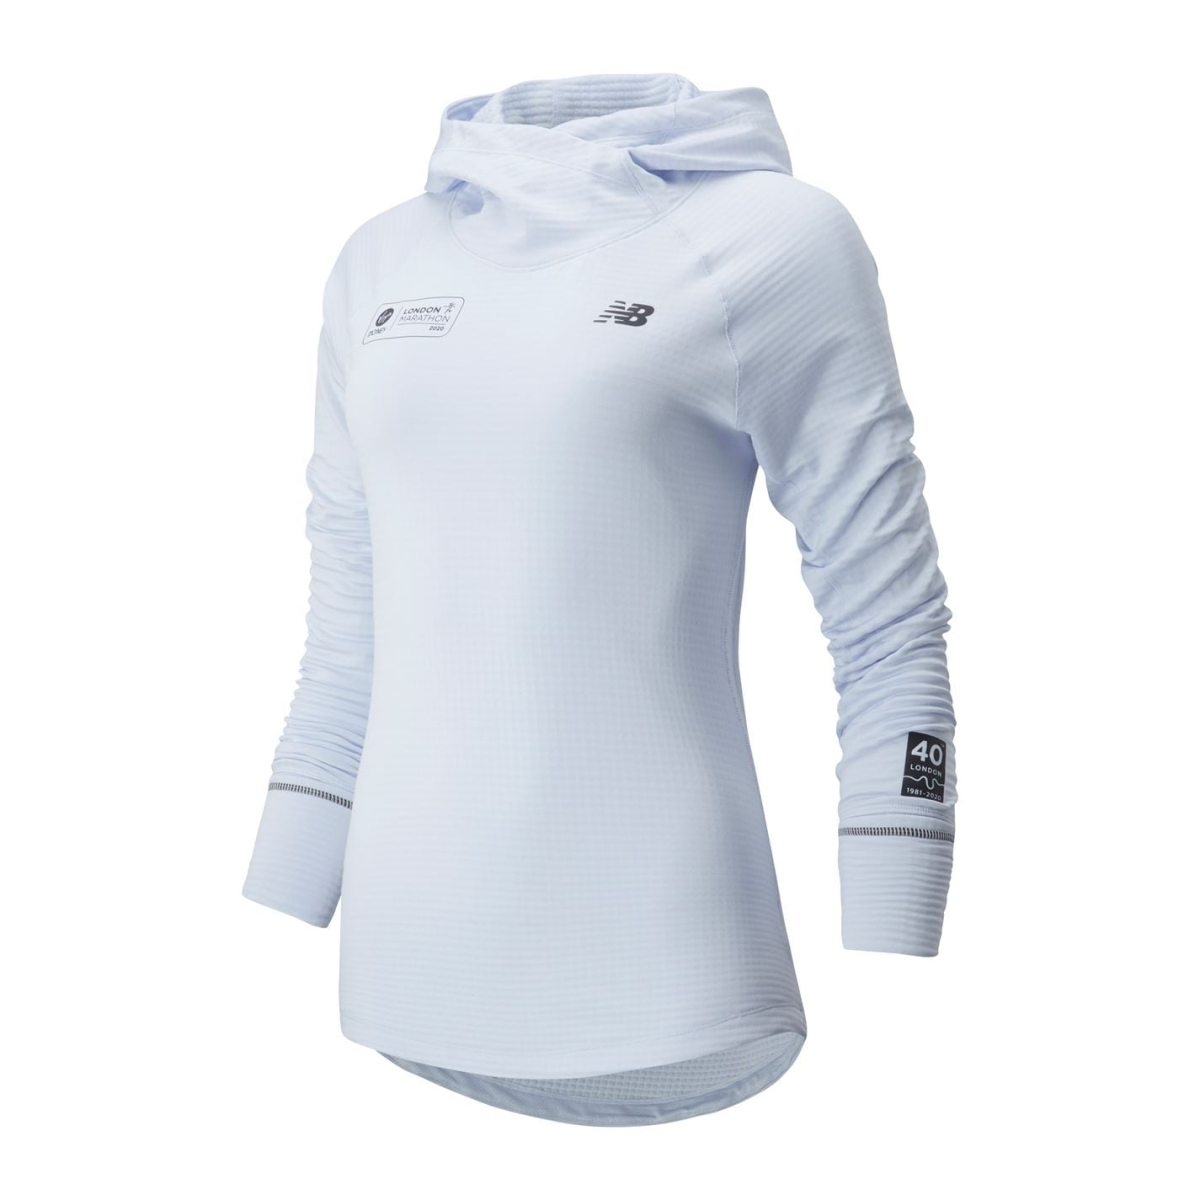 New Balance Kapuzenjacke Jacke Kapuzenpullover Damen Sweatshirt Pullover 6076